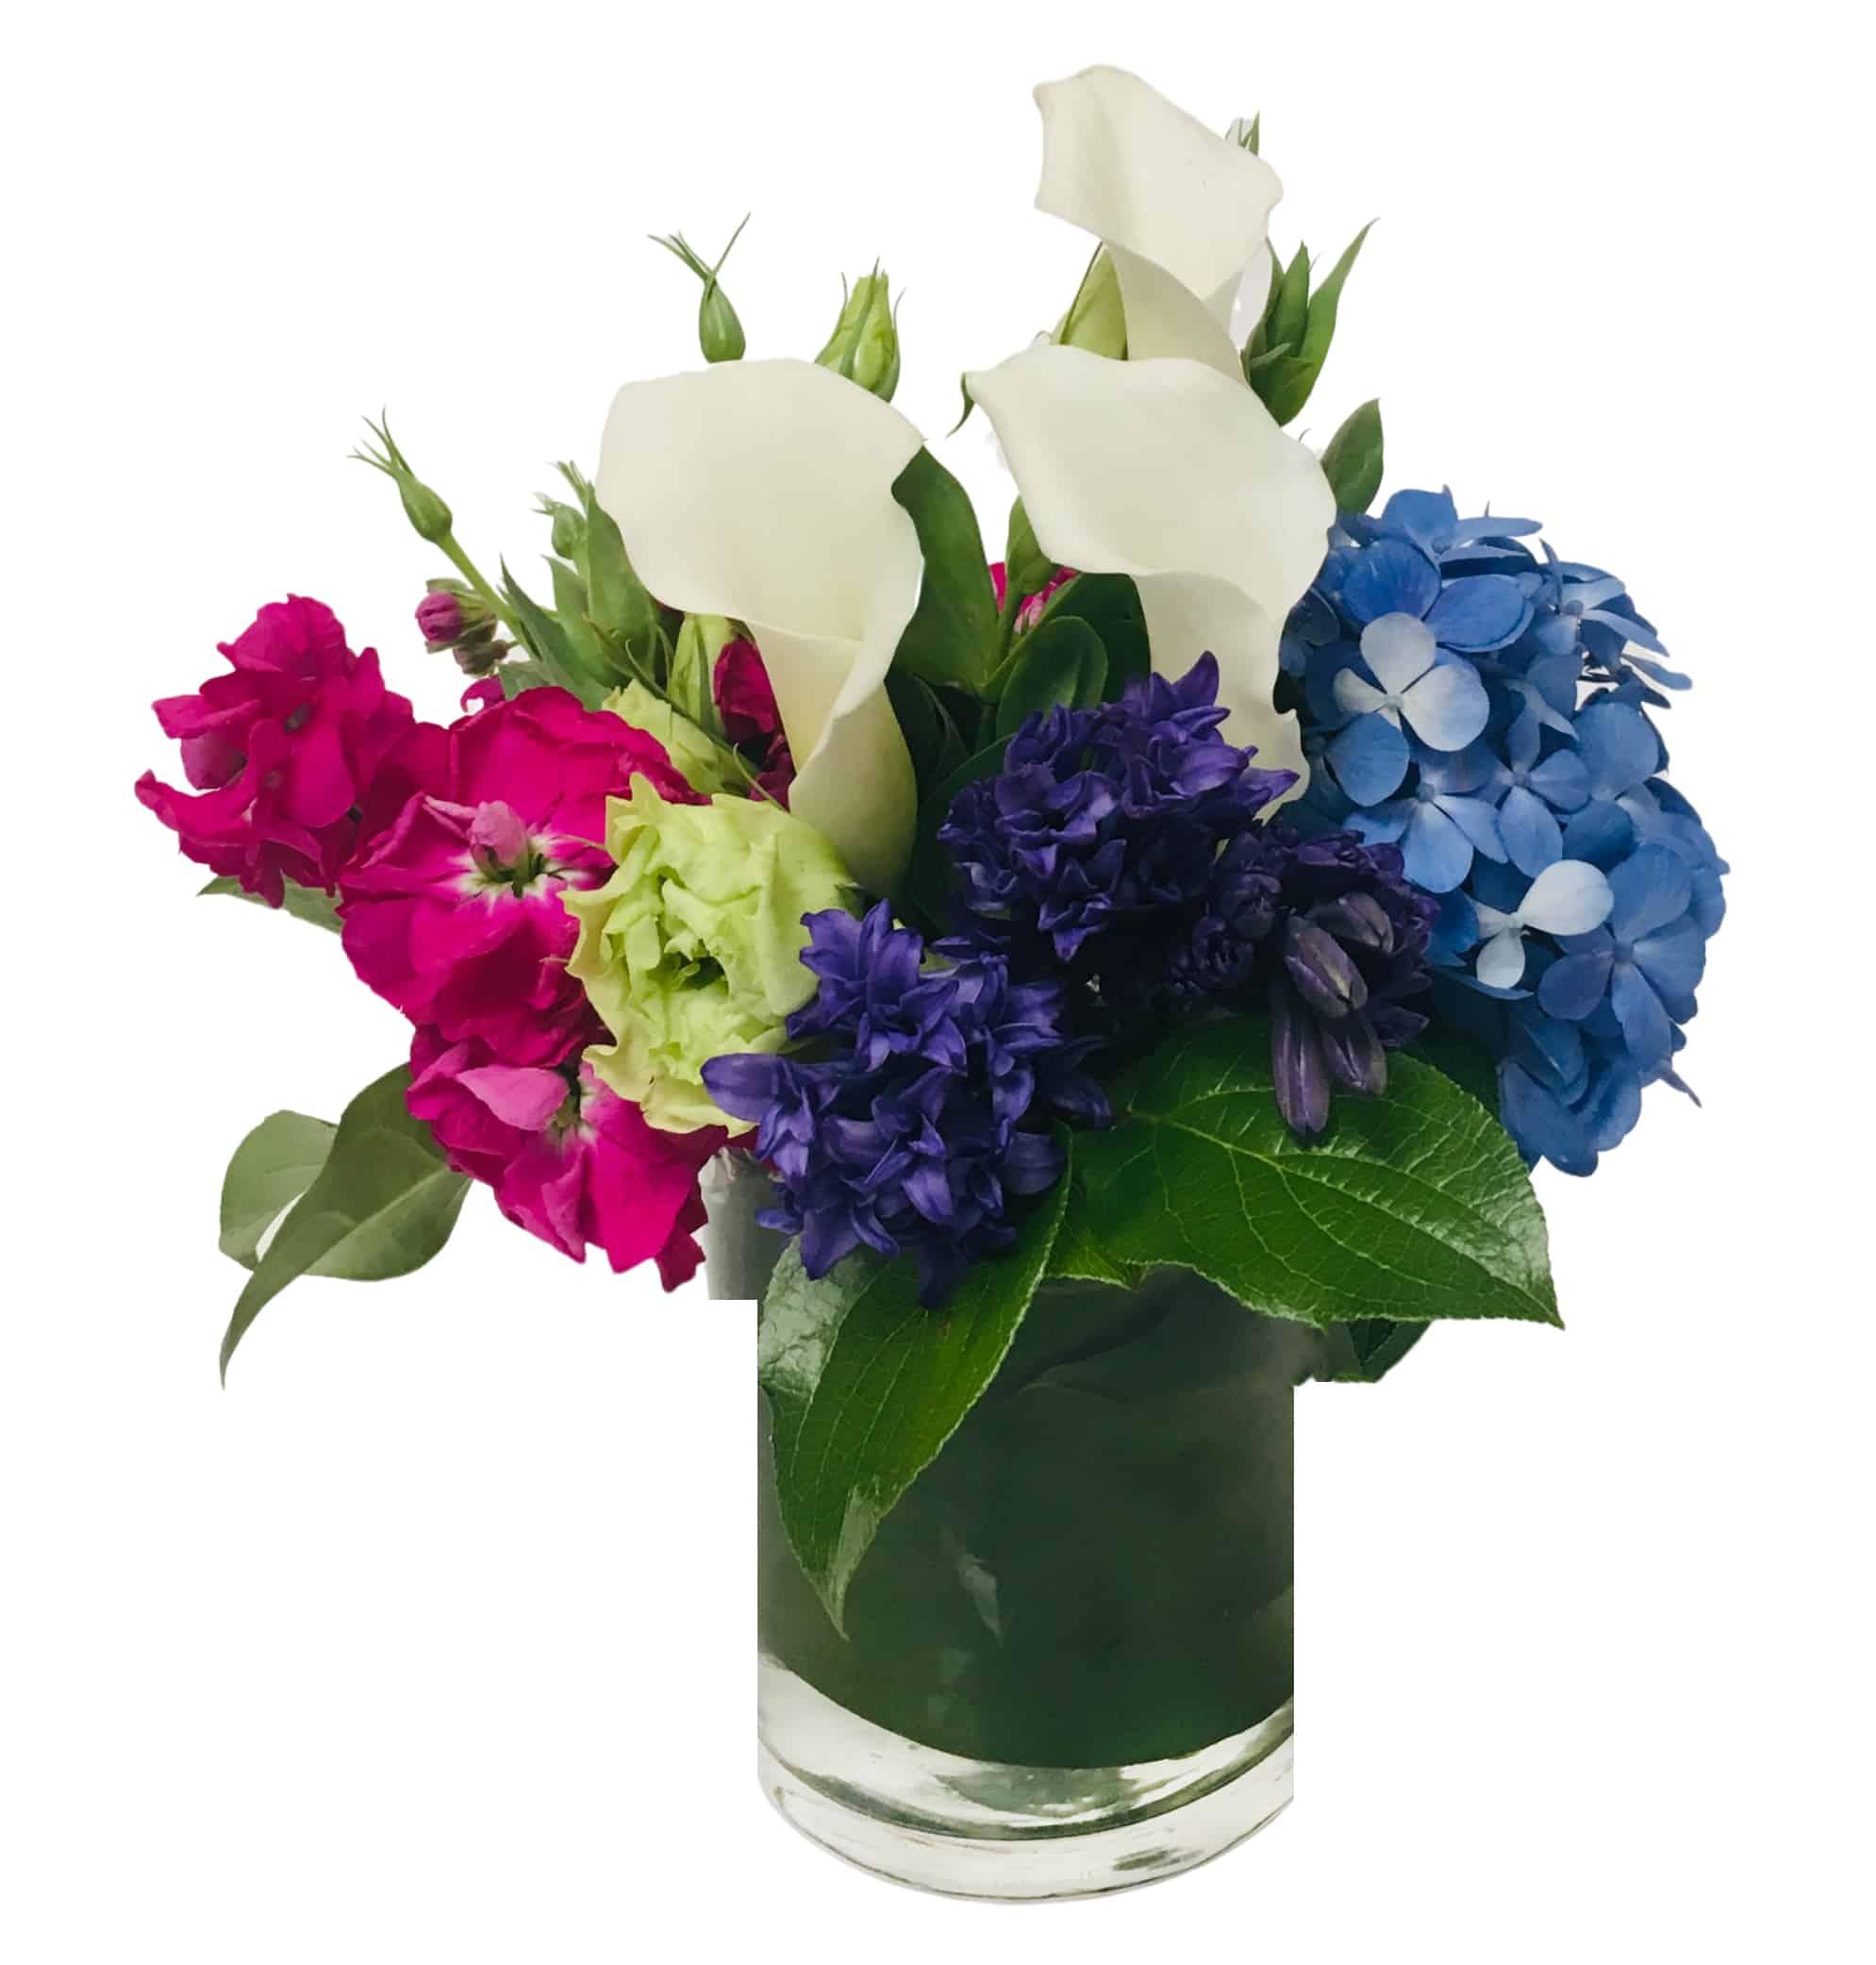 Success Flower Arrangement | San Francisco Florist Since 1871 Free Bay Area and San Francisco Flower Delivery